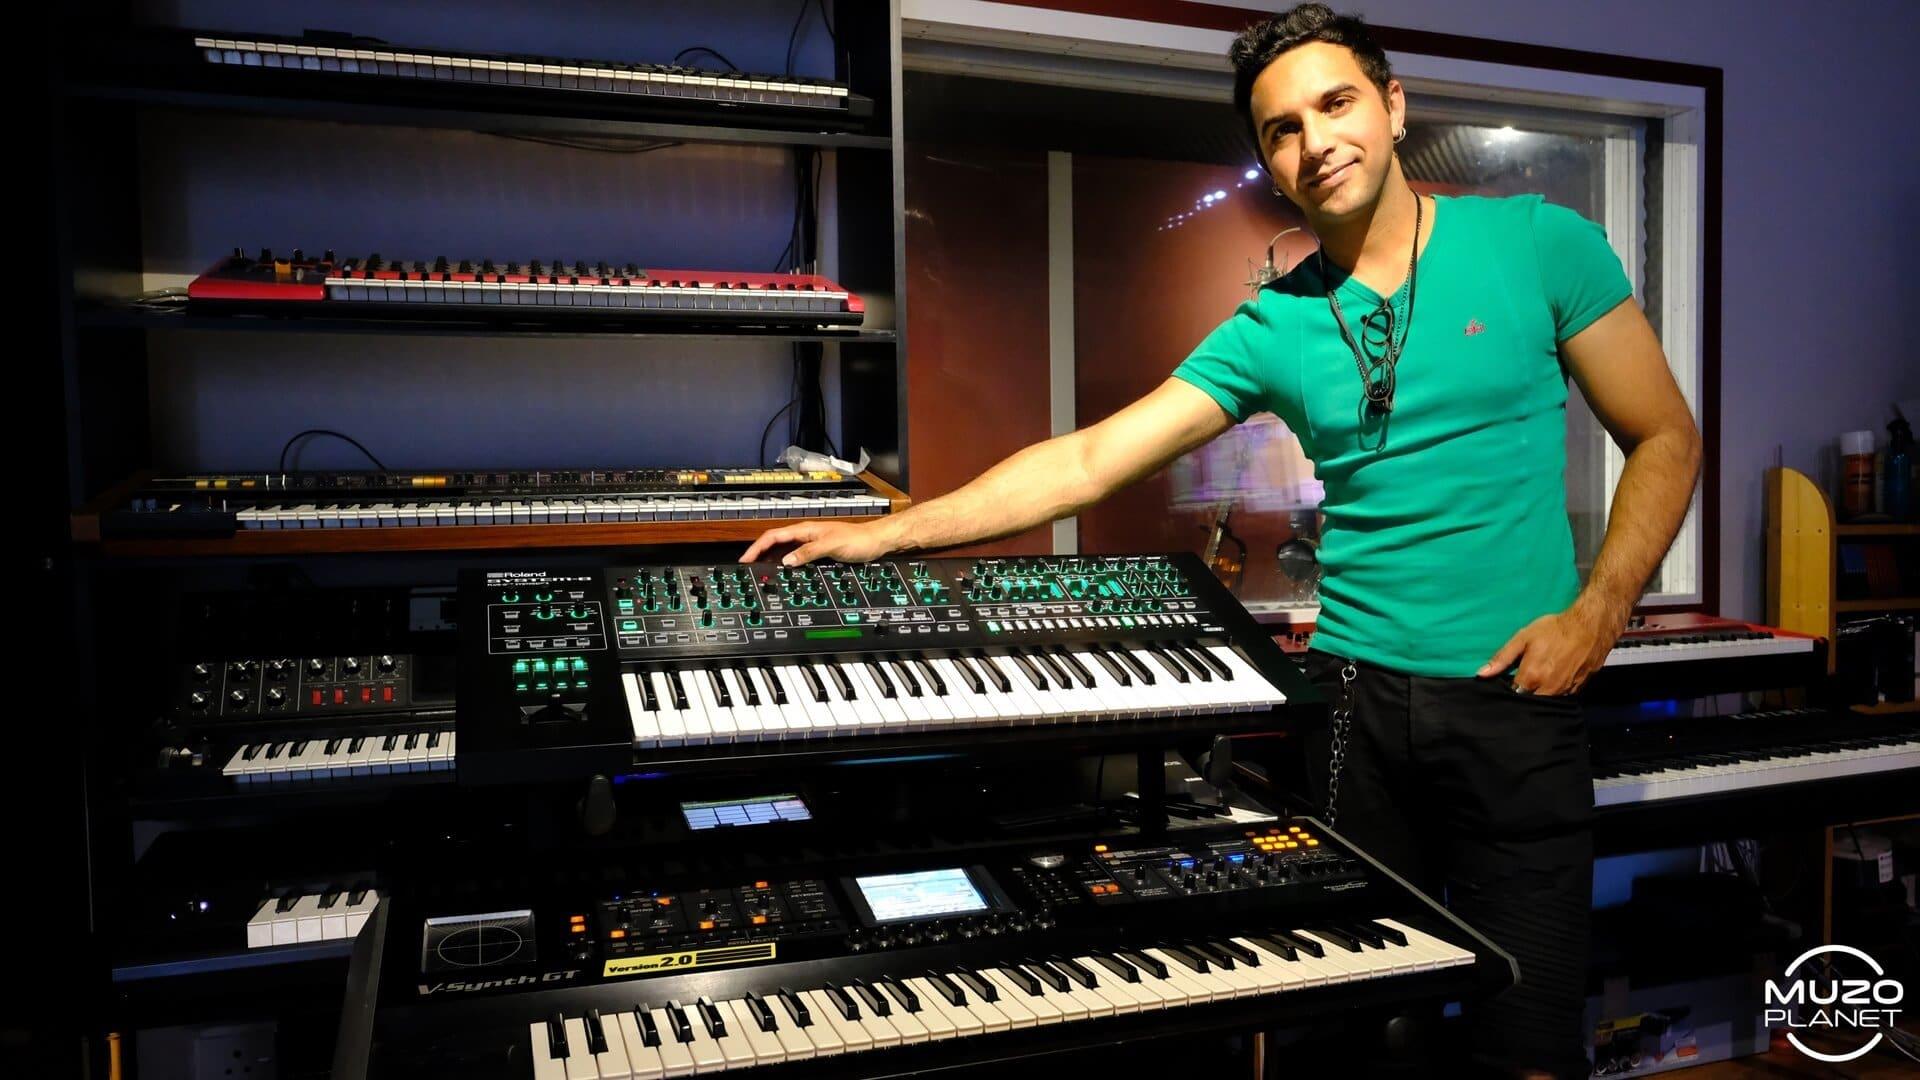 kyle petersen musician - Roland Keyboards